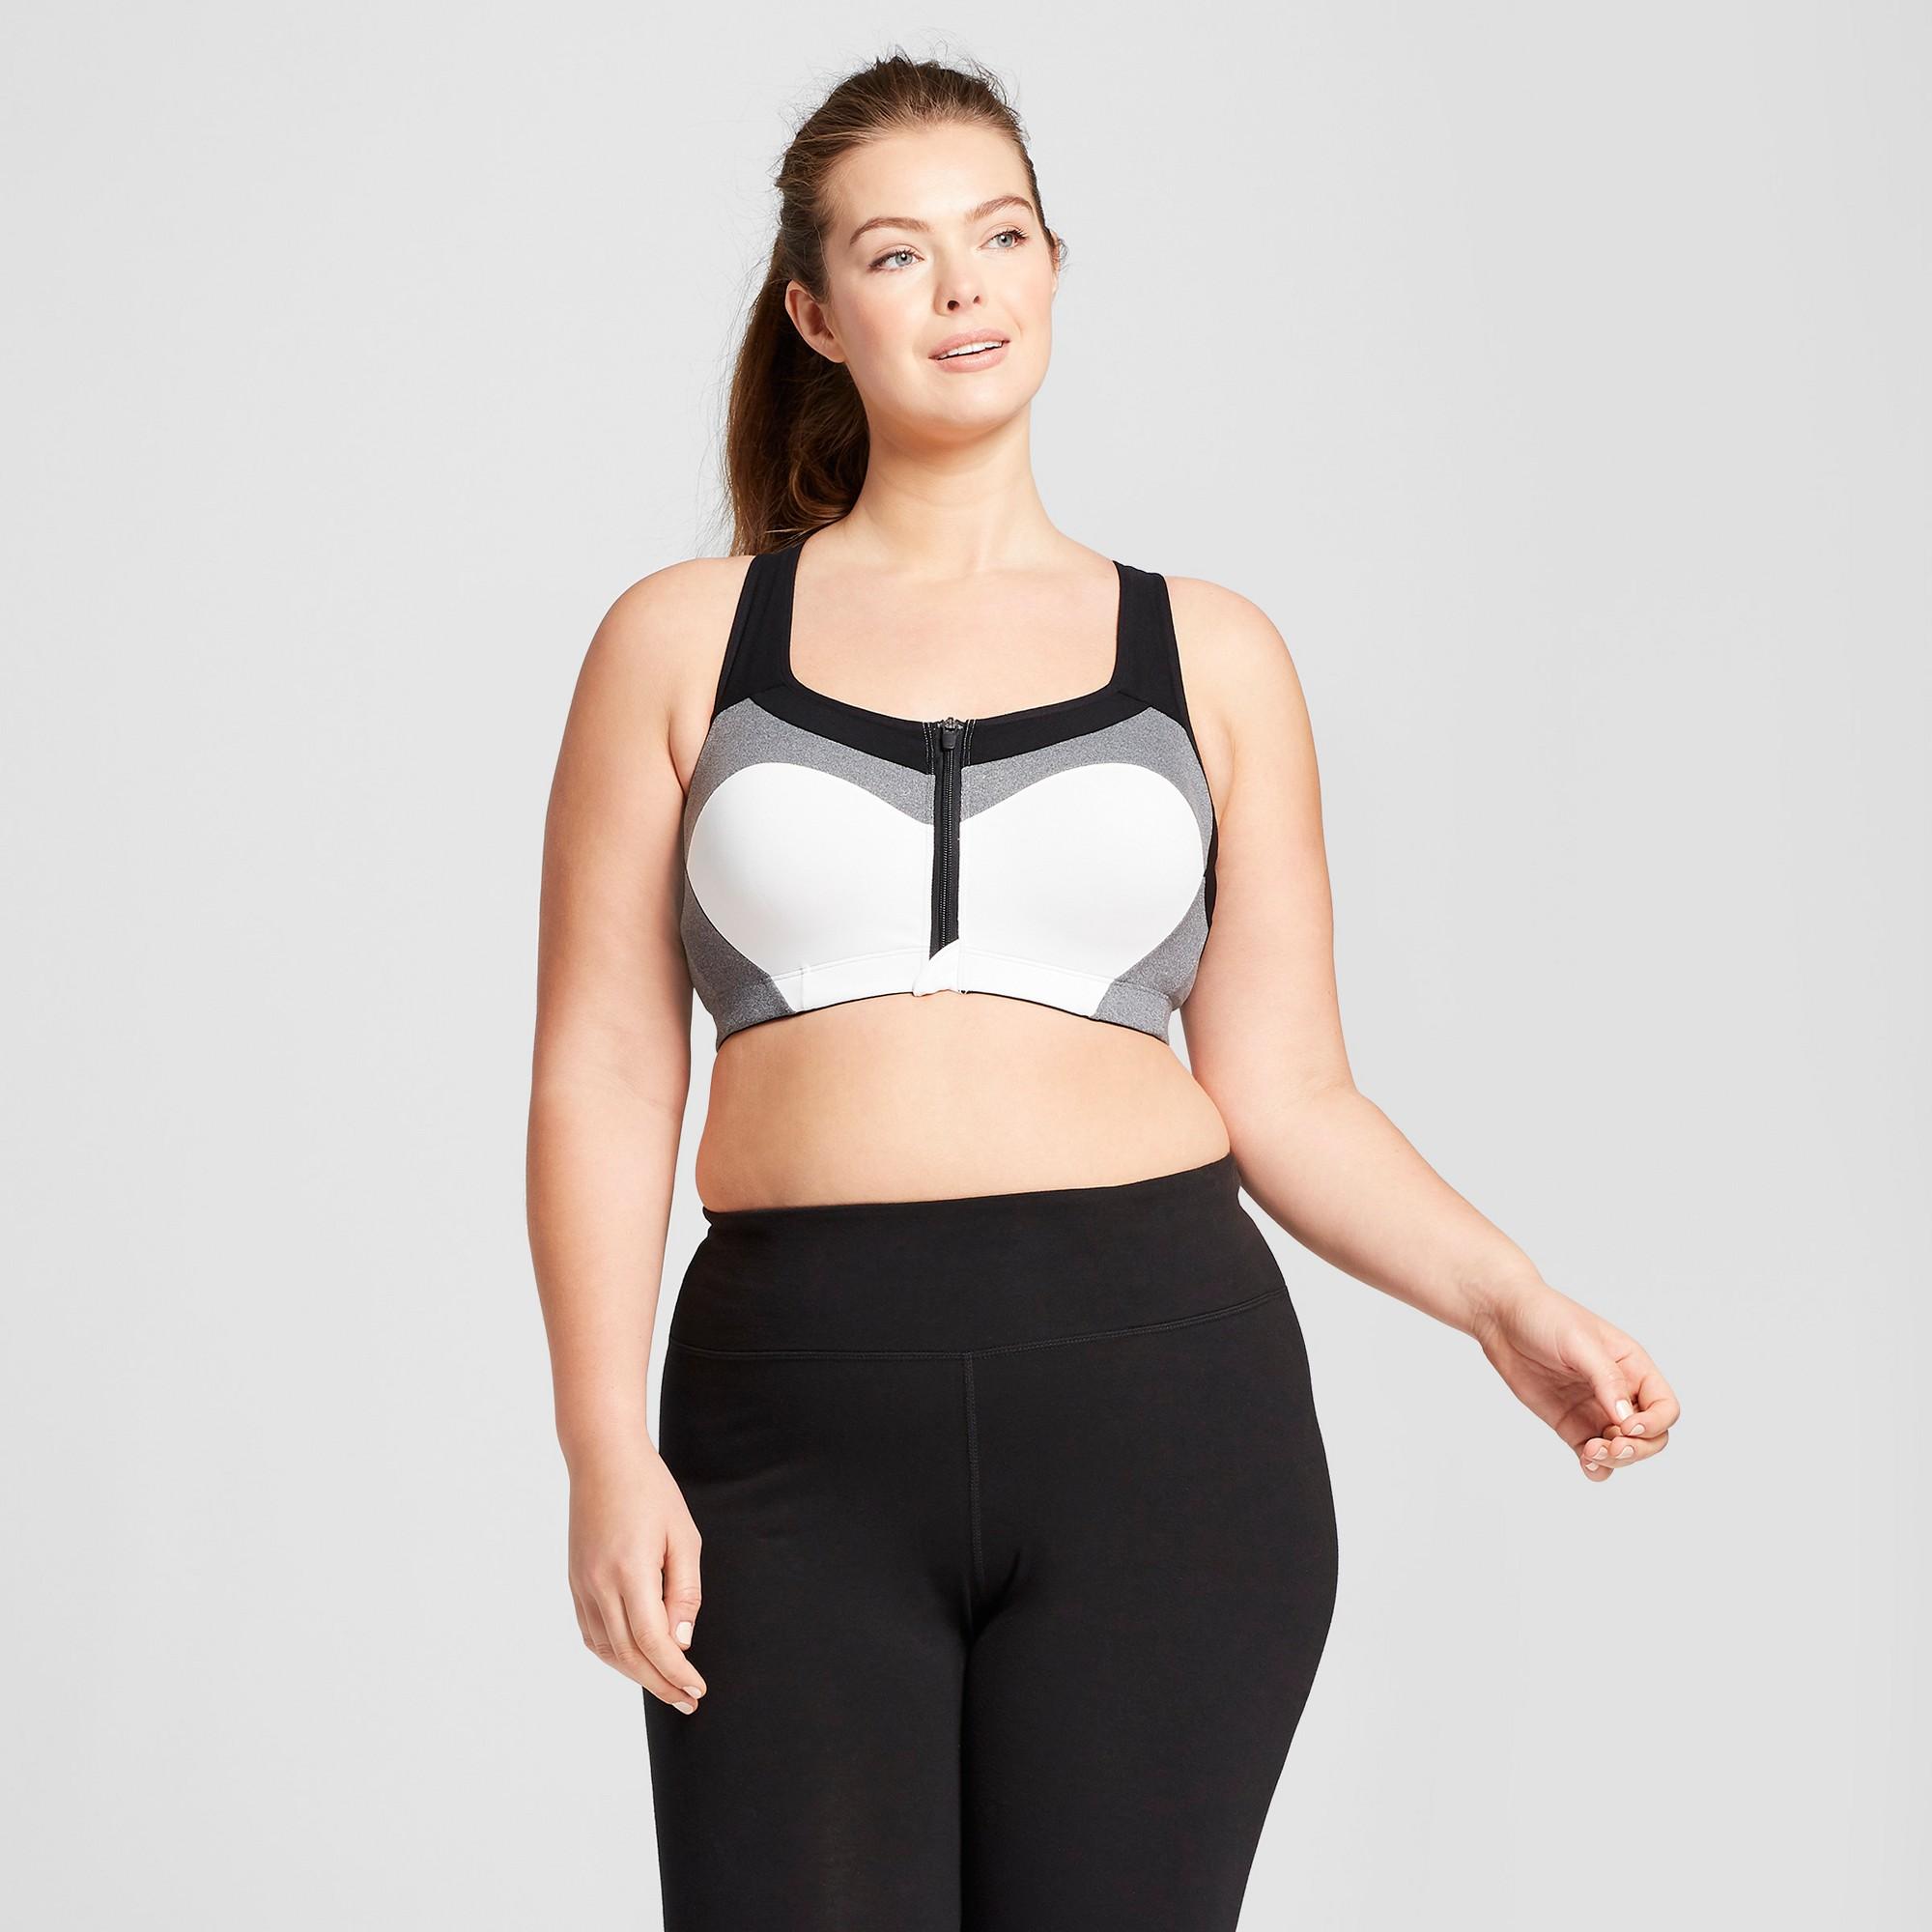 cd7480d63041b Women s Plus-Size Power Shape Max Support Front-Close Sports Bra - C9  Champion White   Dark Heather Gray 42C